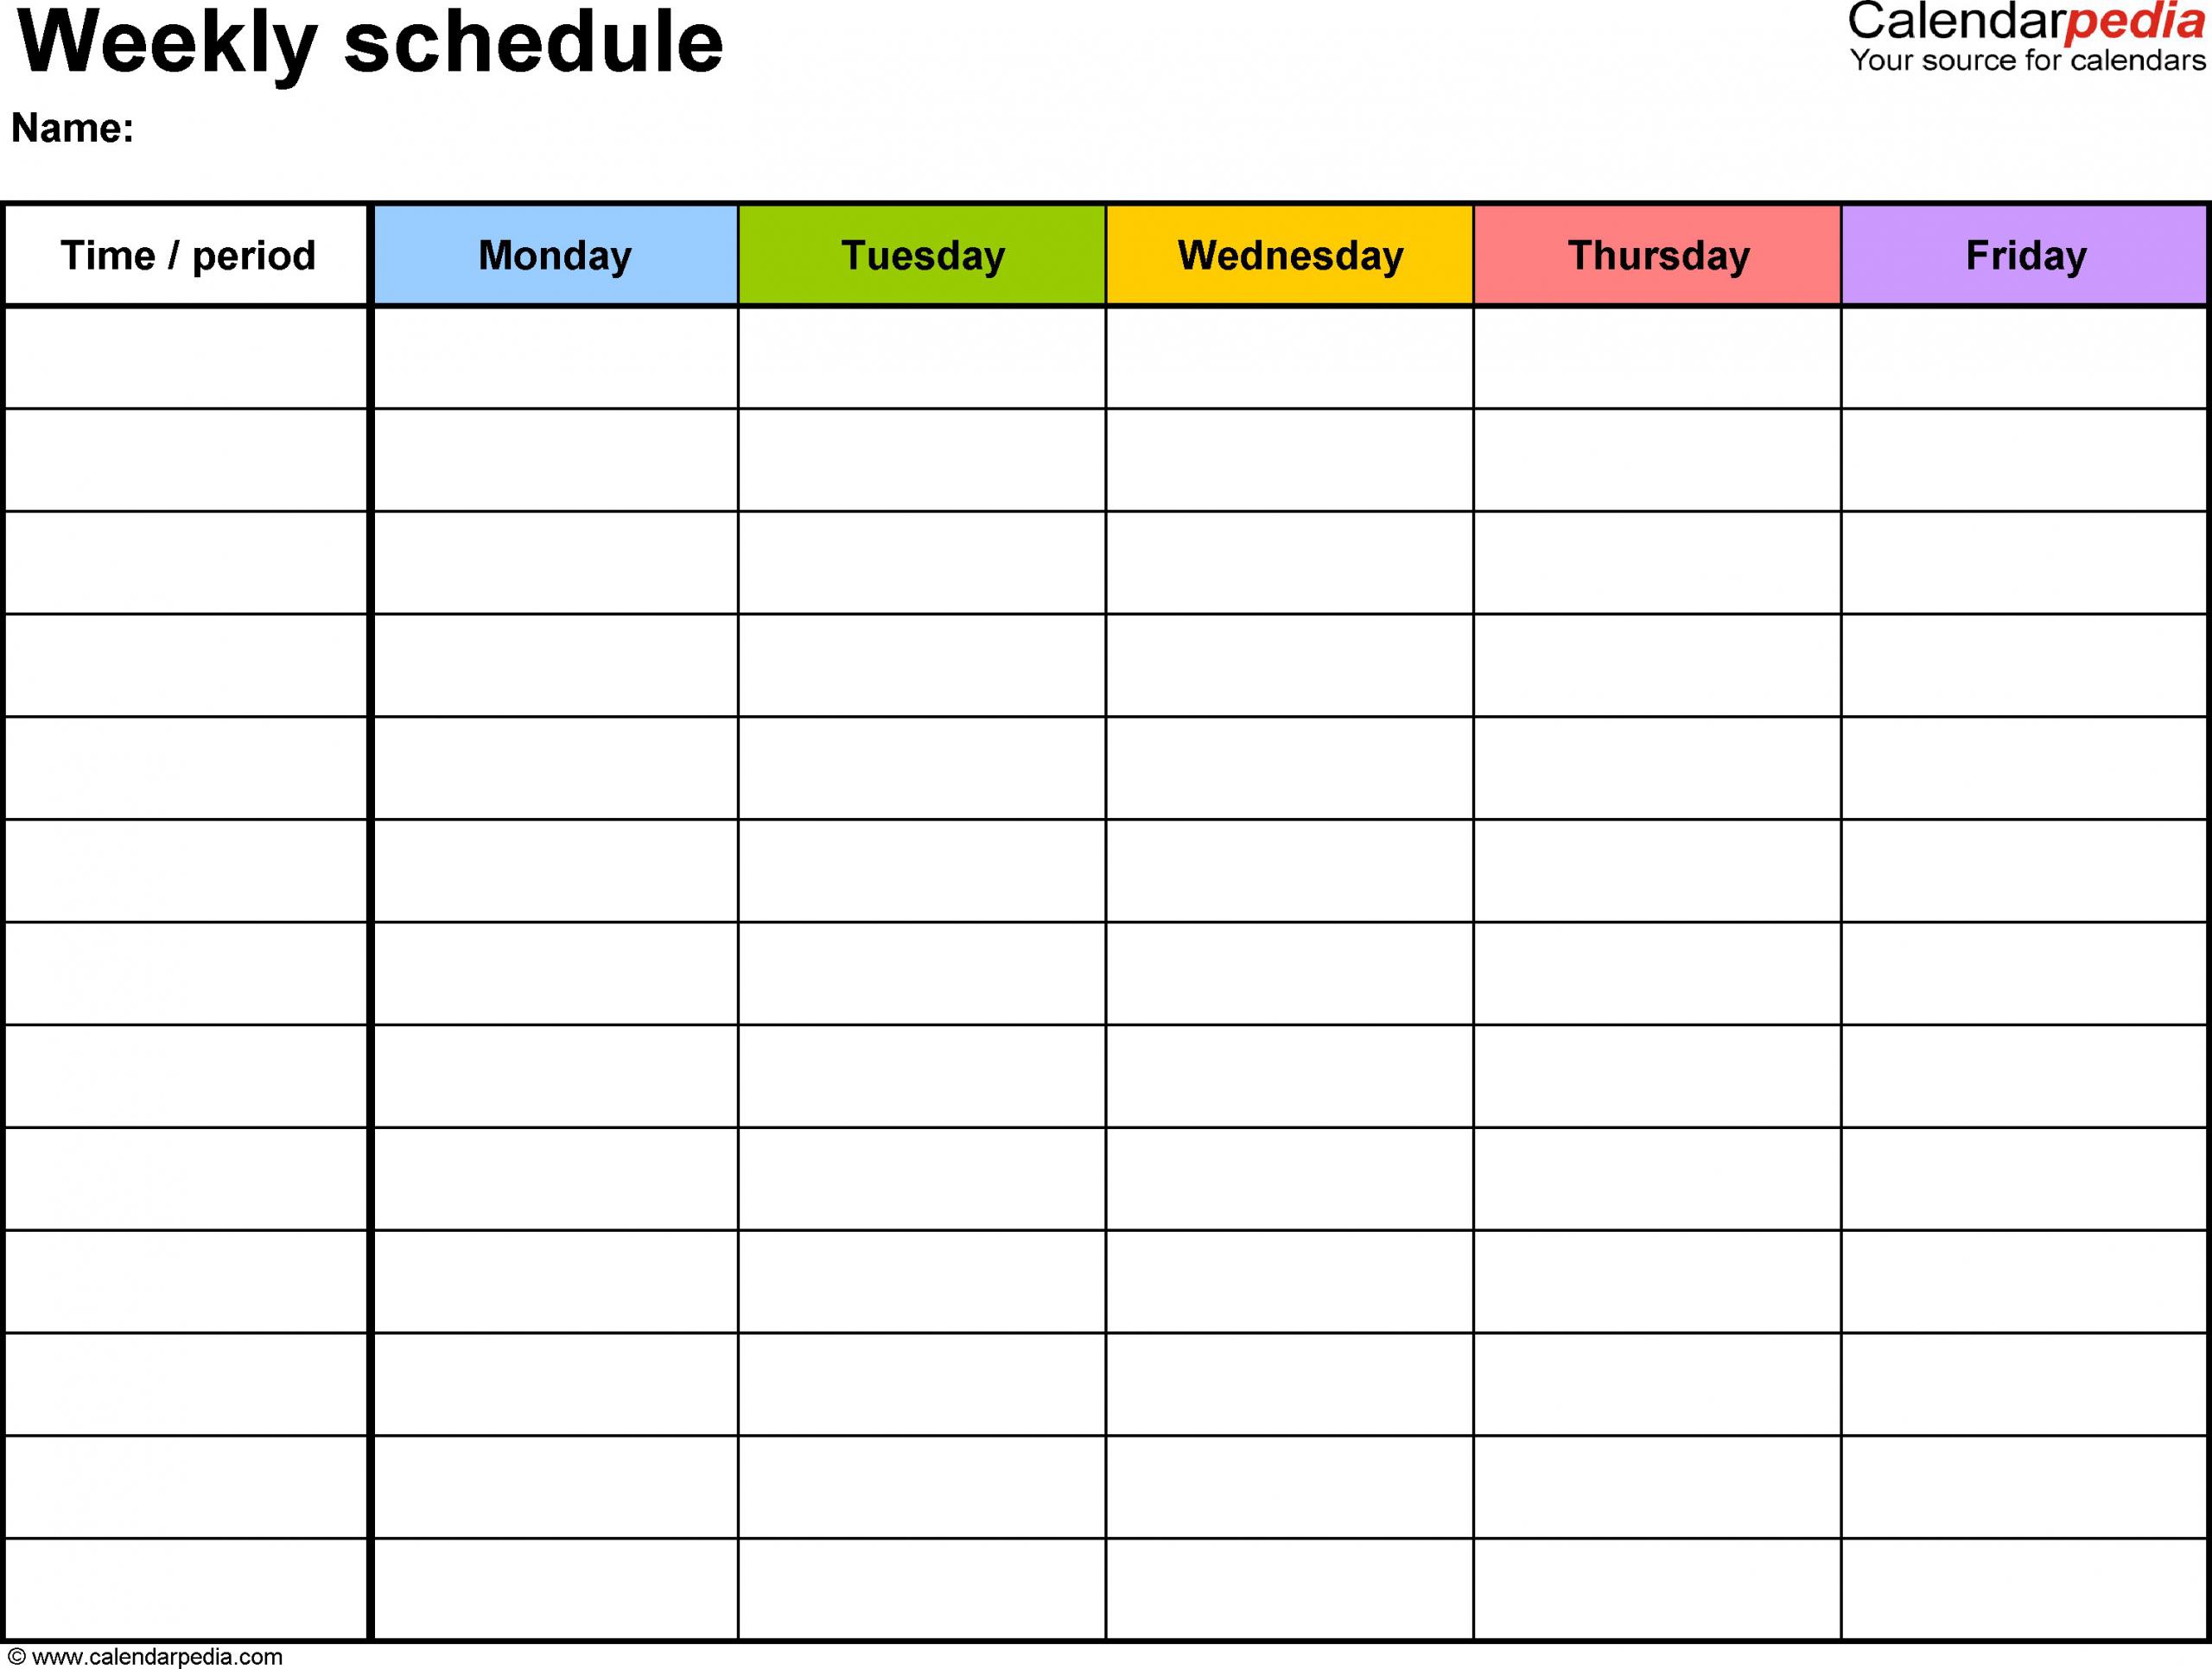 Monday Friday Calendar In 2020 | Daily Schedule Template throughout Free Printable Calendar Monday Through Friday